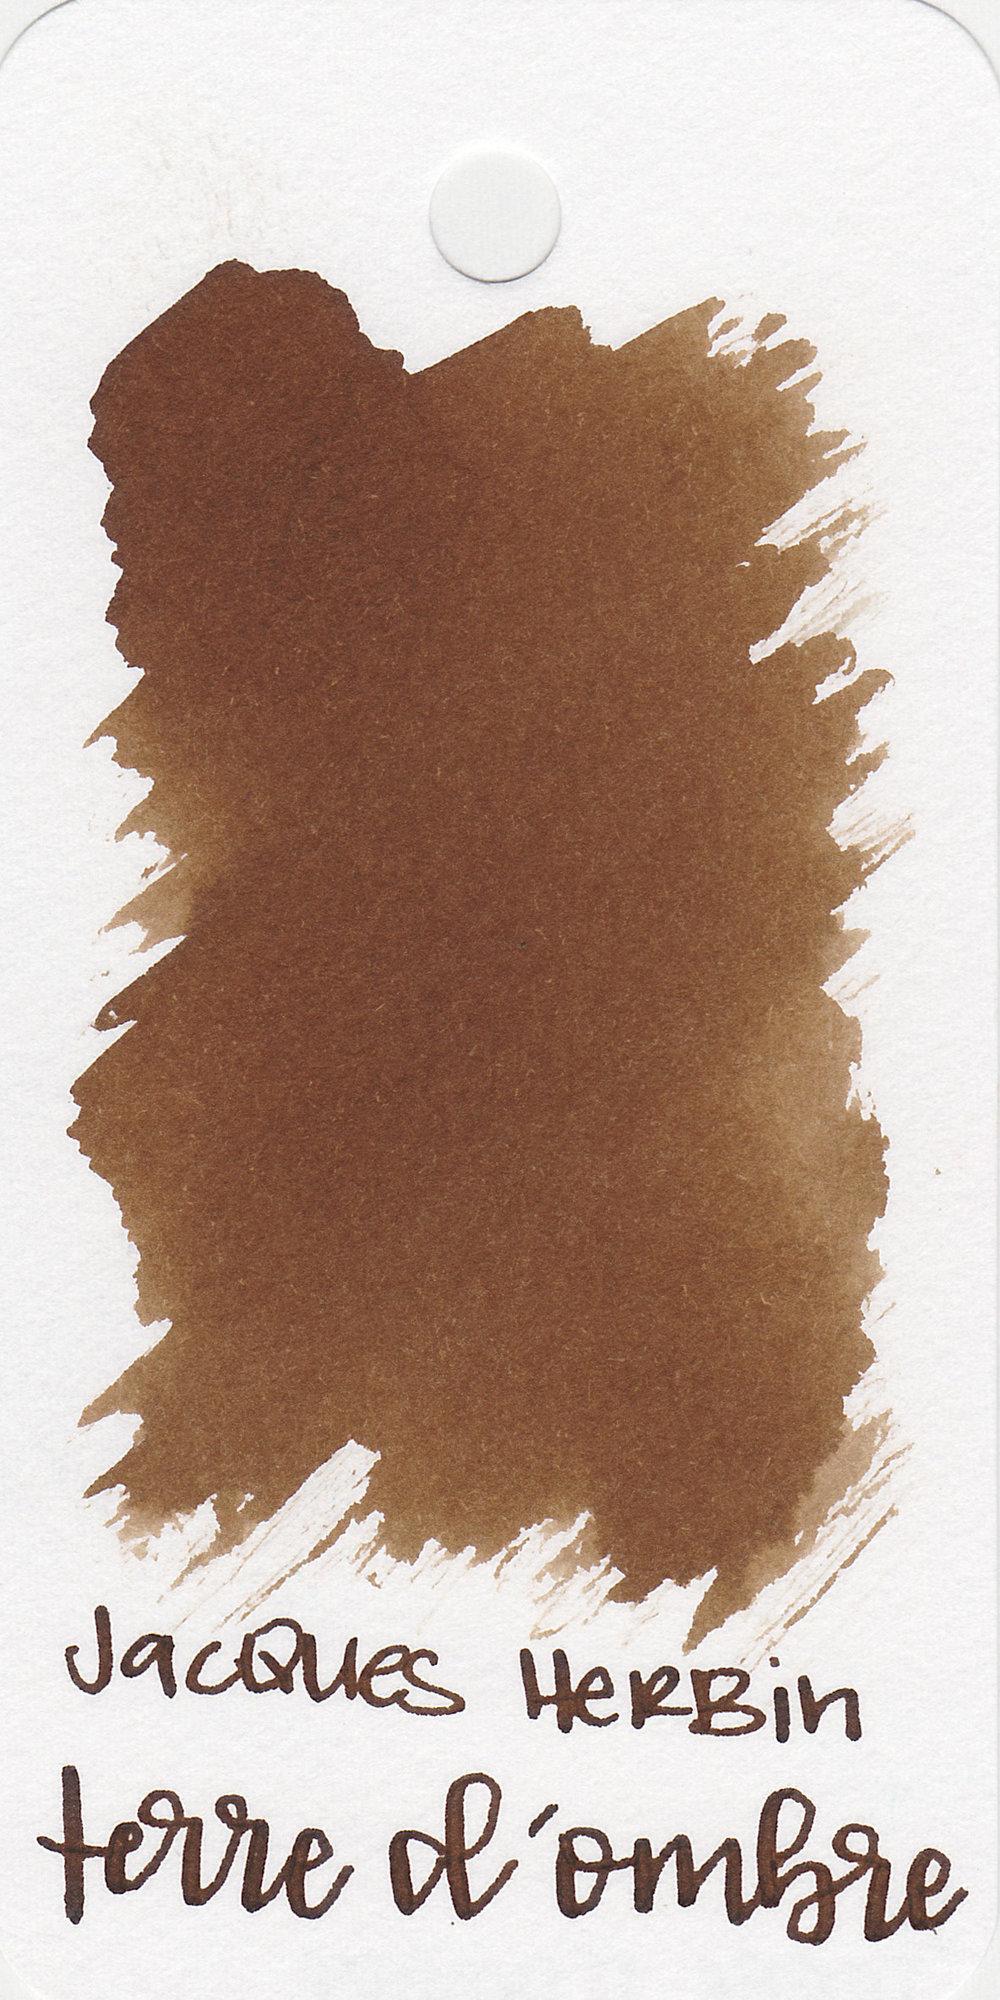 jh-terre-d-ombre-1.jpg